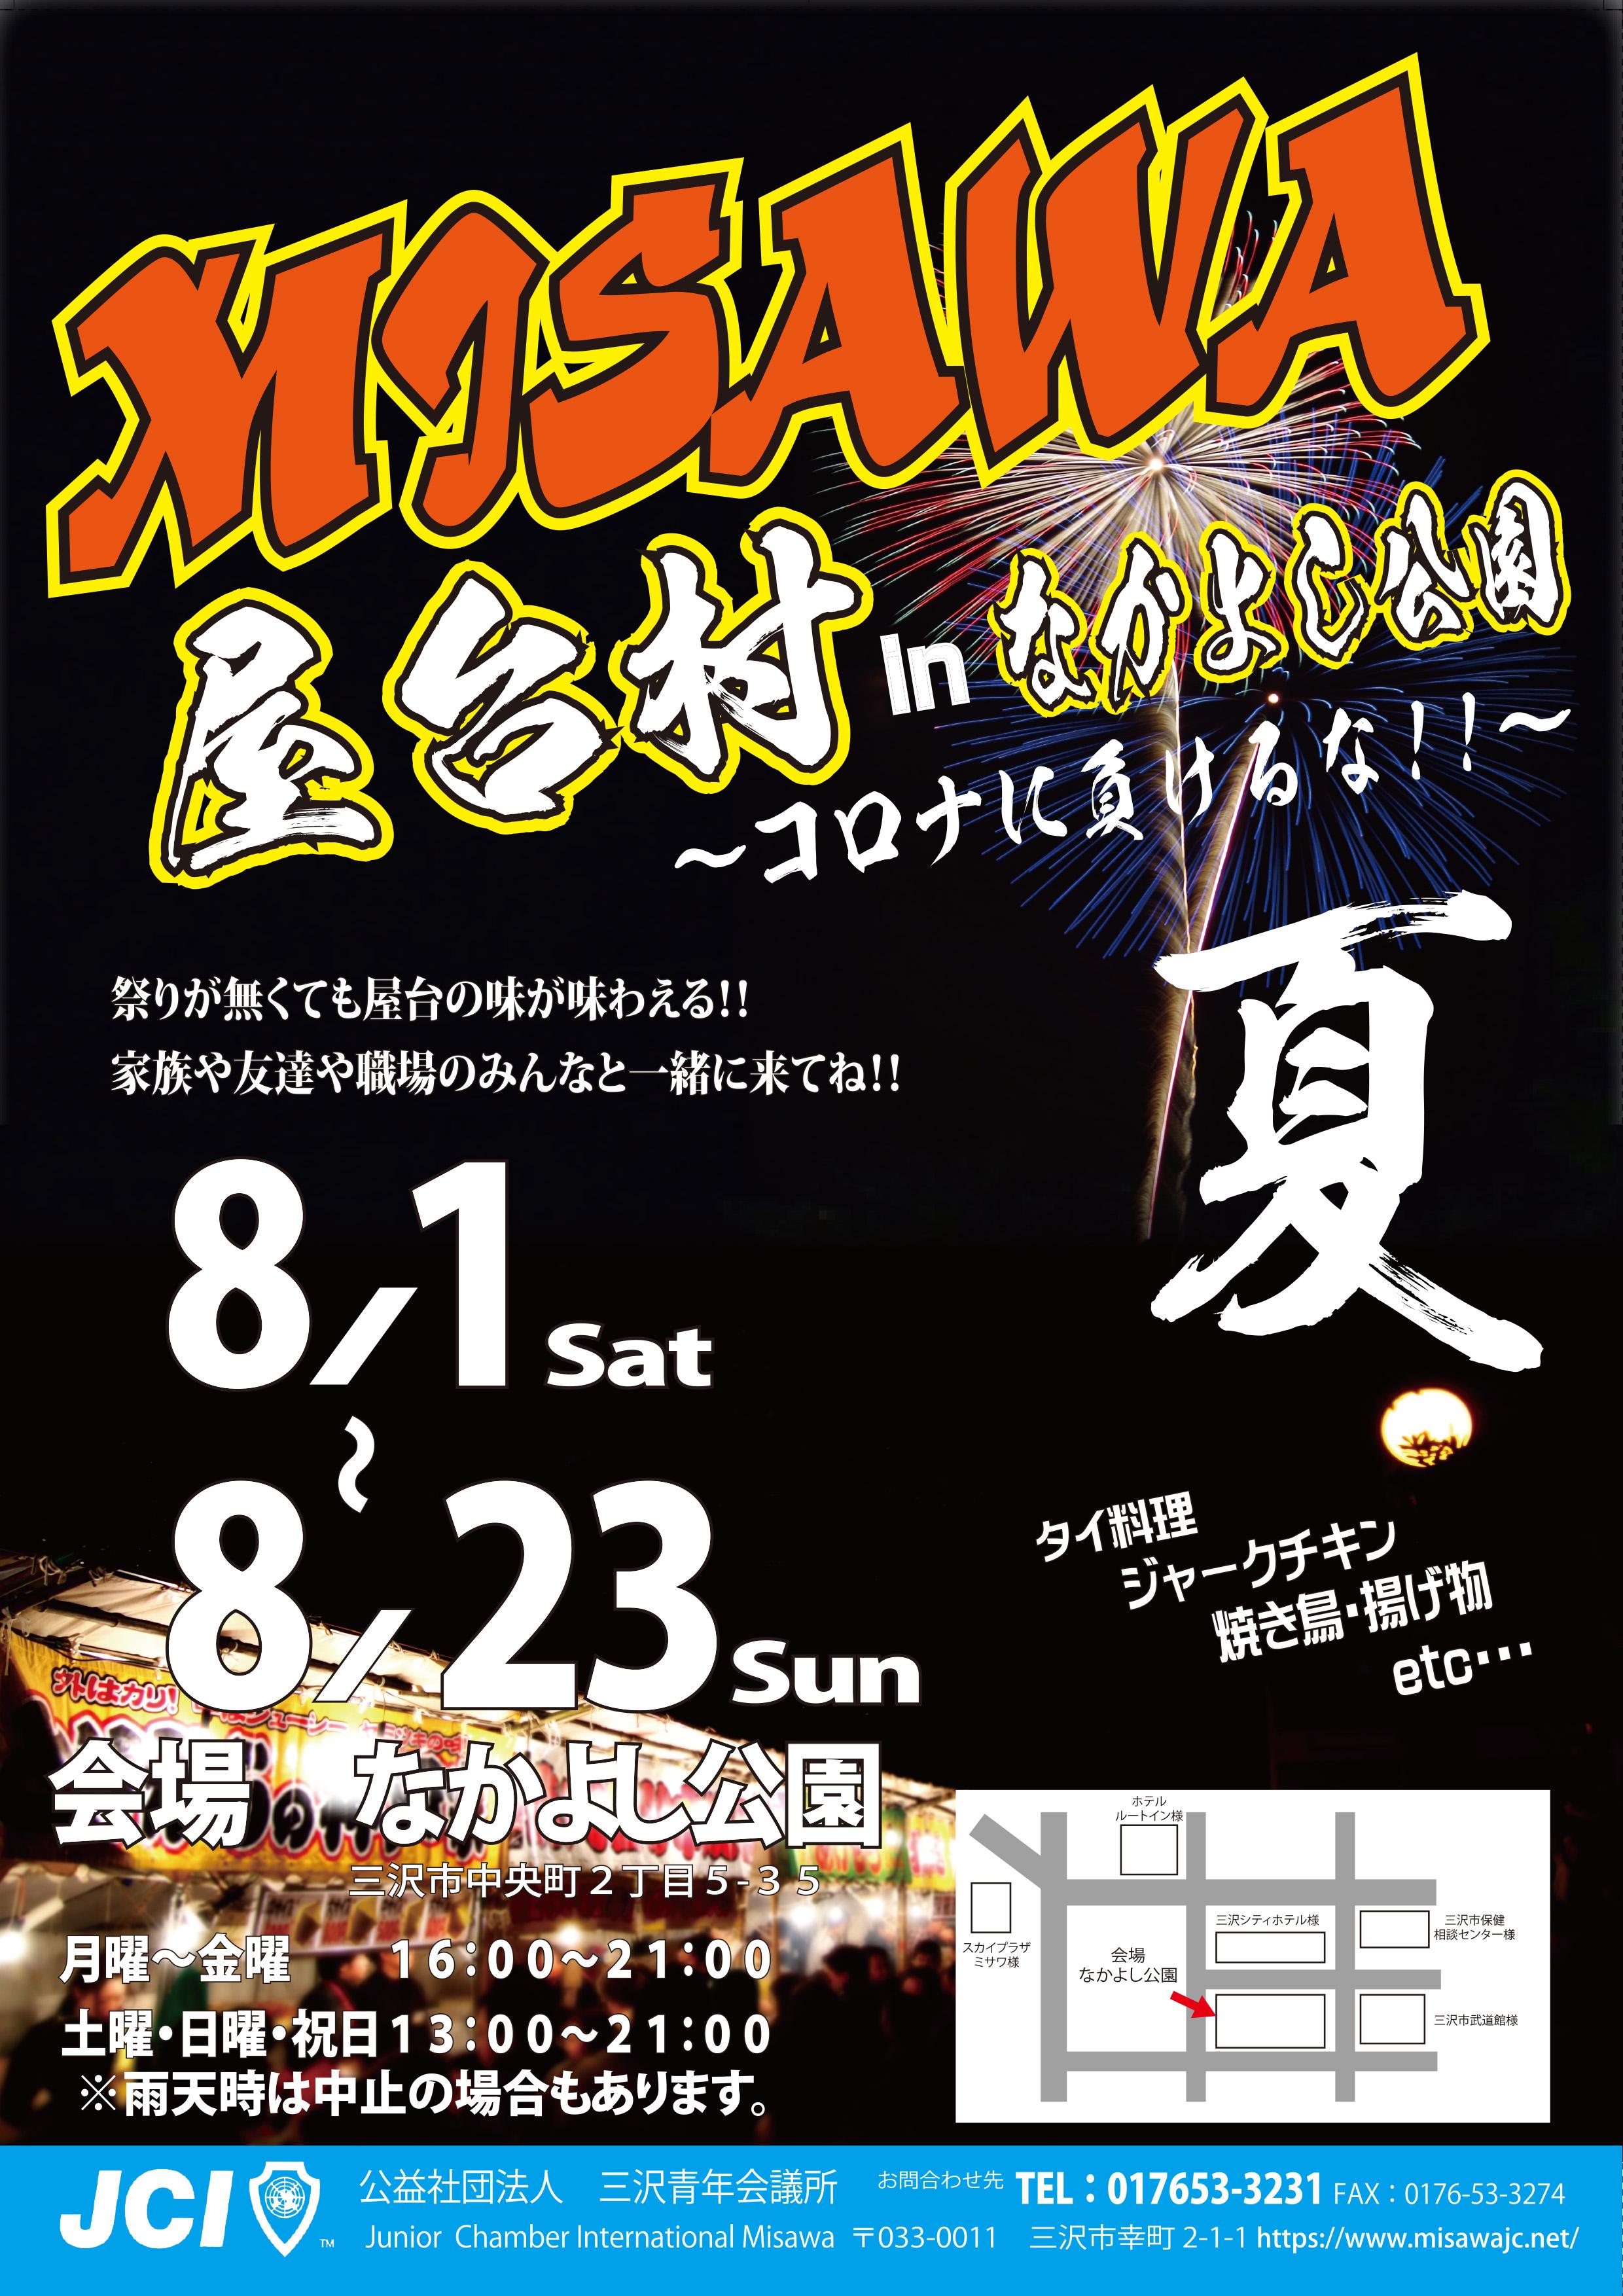 MISAWA屋台村inなかよし公園〜コロナに負けるな!!〜夏 開催!